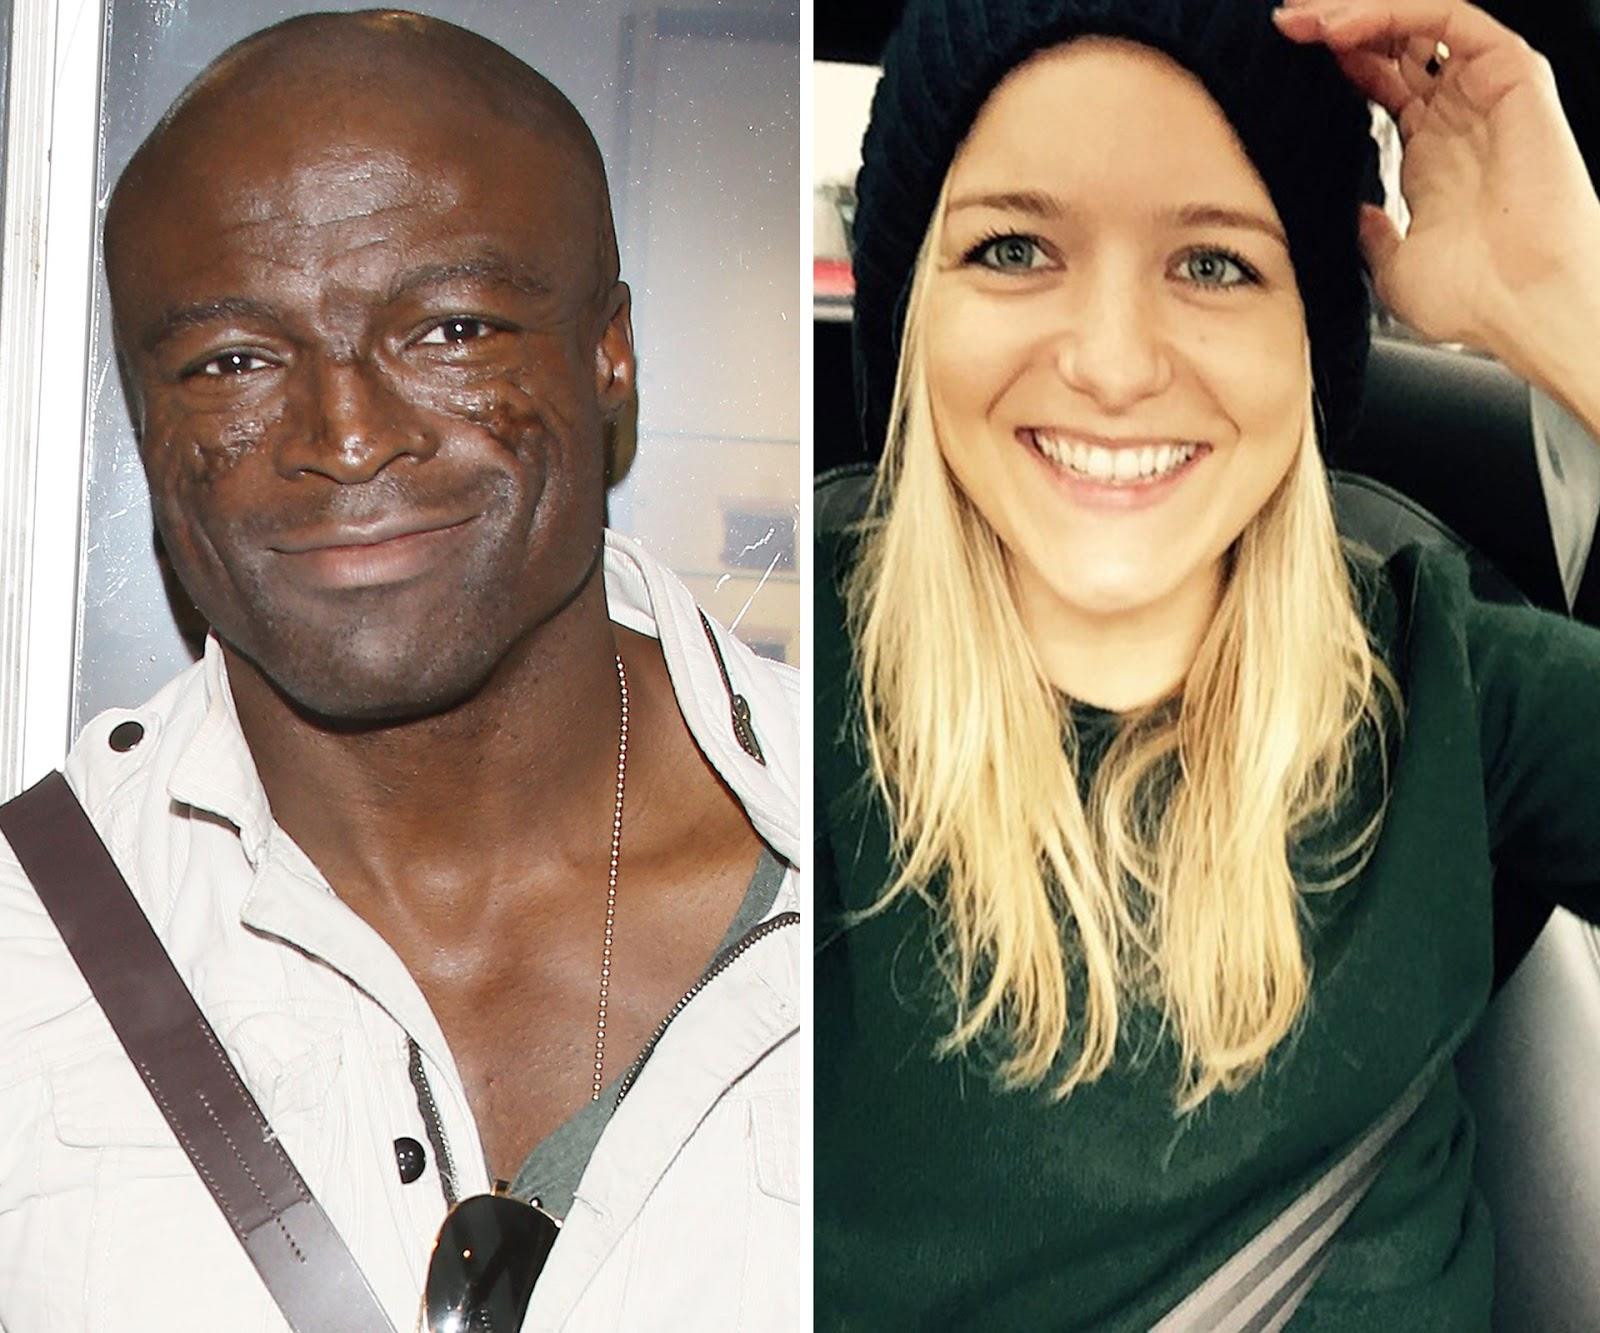 Singer Seal dumps new girlfriend after their relationship